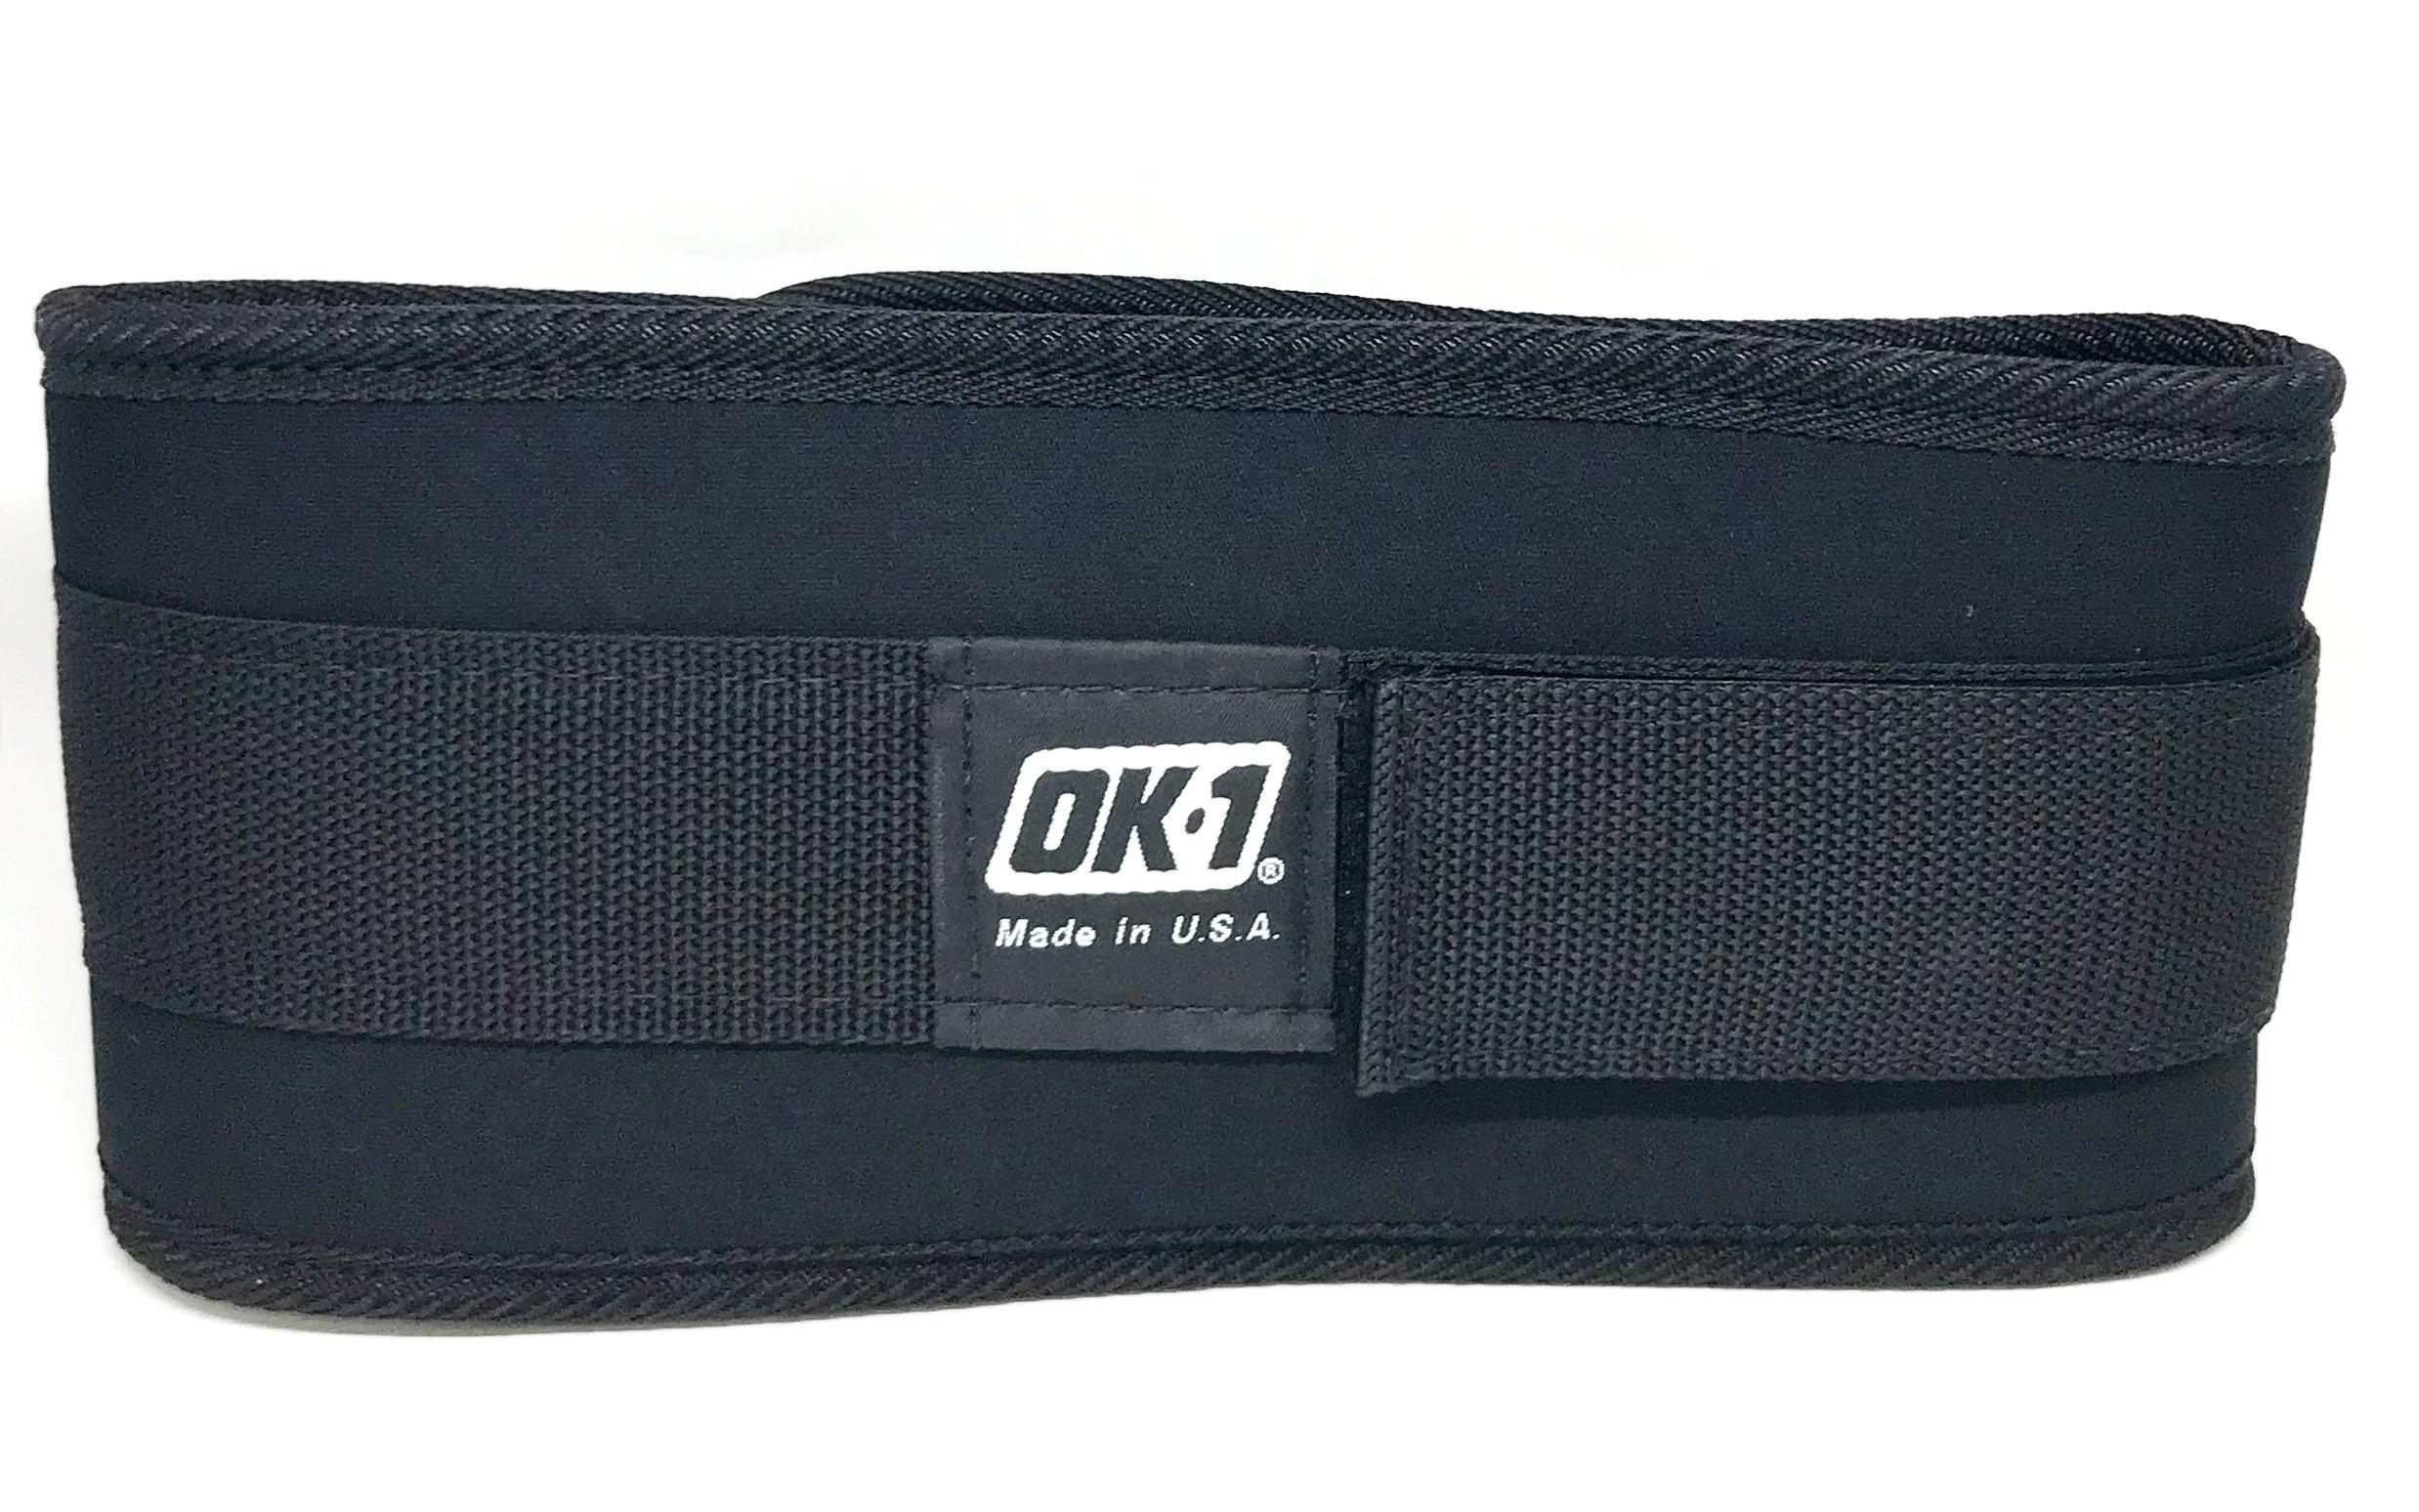 OK-1 Safety OK-ANB5 Small Back Support Belt, Waist Size: 22-28 Inch by OK-1 Safety